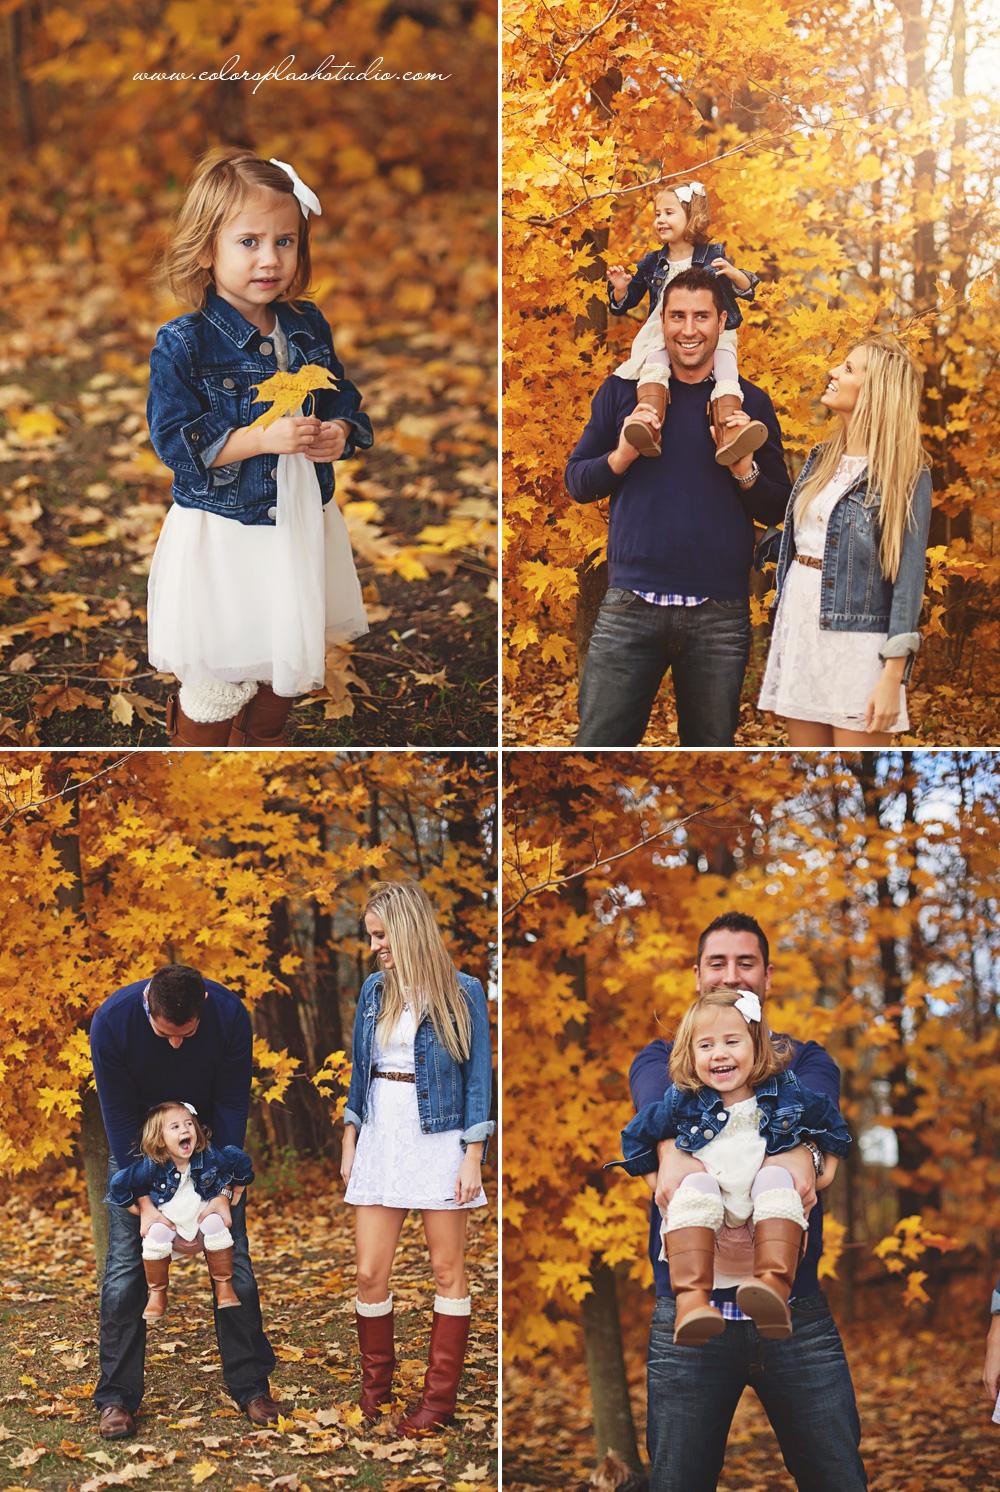 Byers Family Fall Photos Kalamazoo Family Photographer  Color Splash Studio  Kalamazoo Family